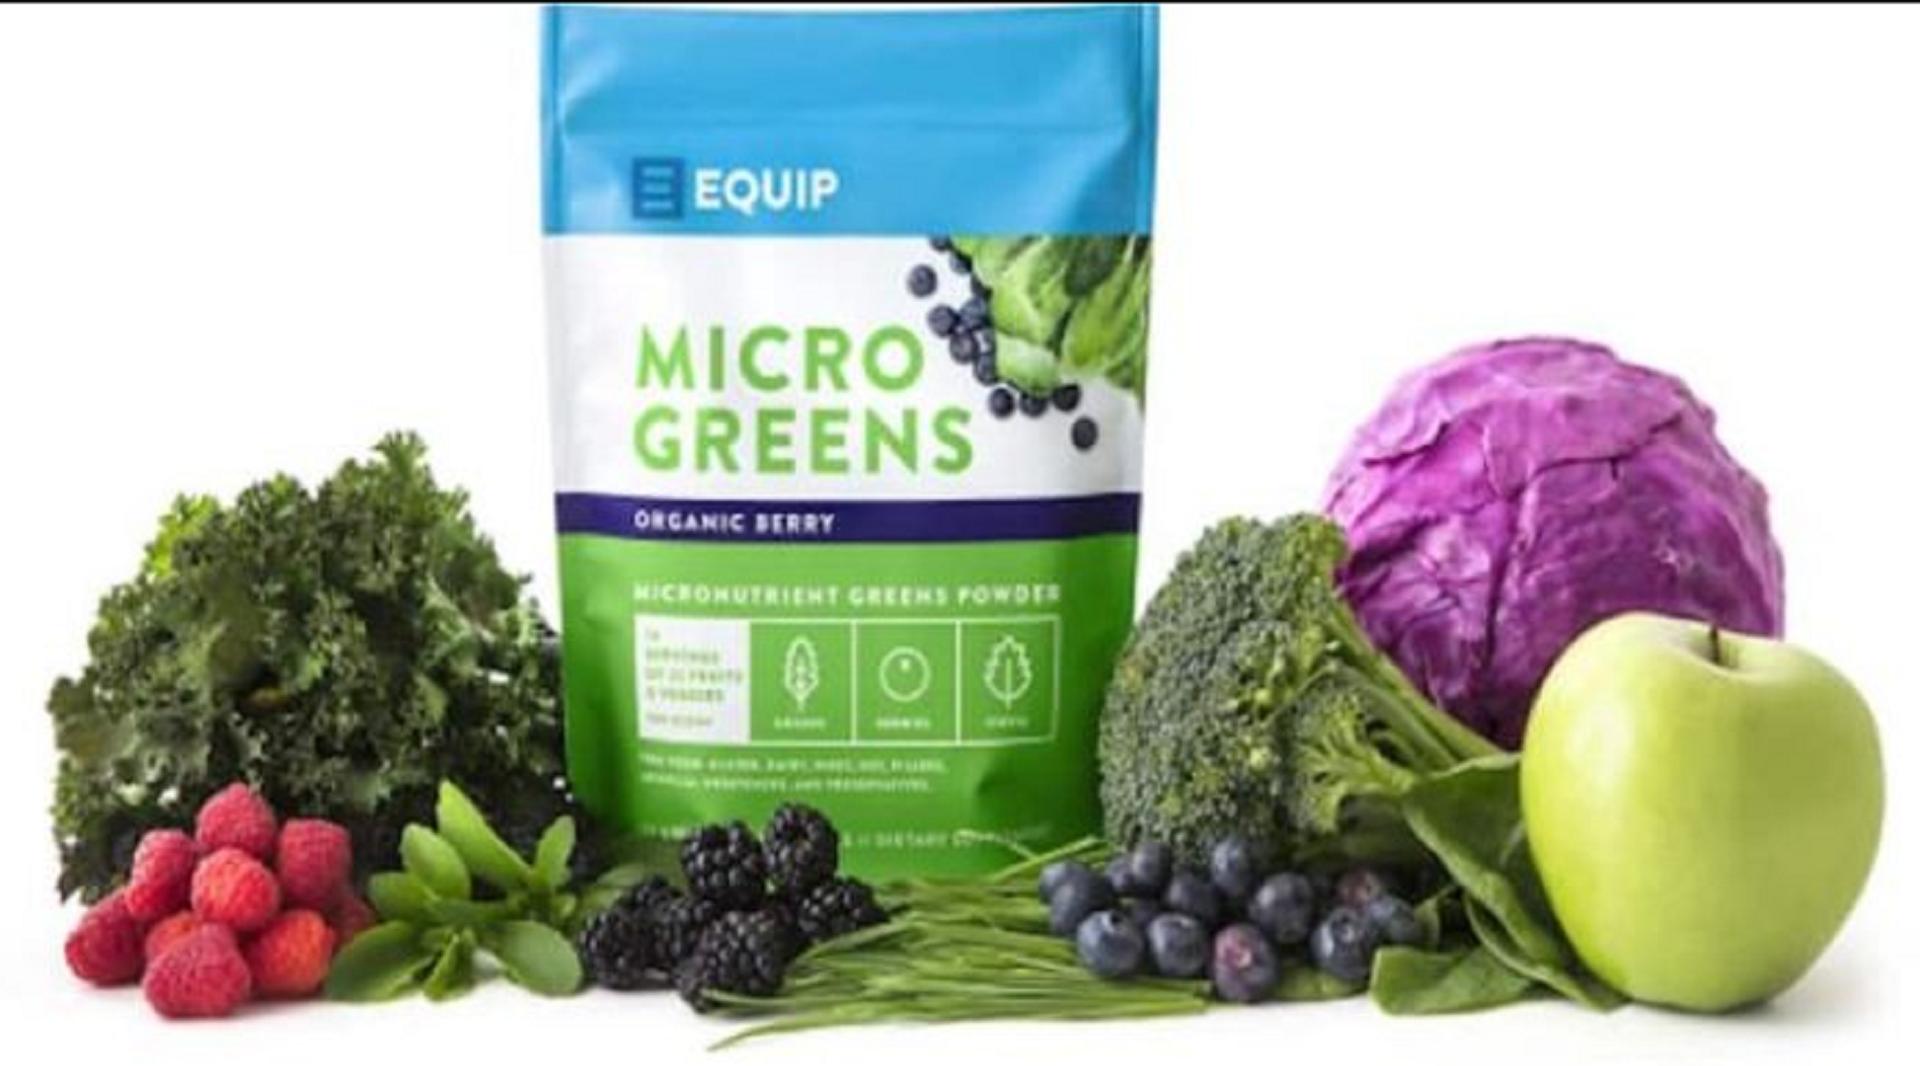 equip organic greens